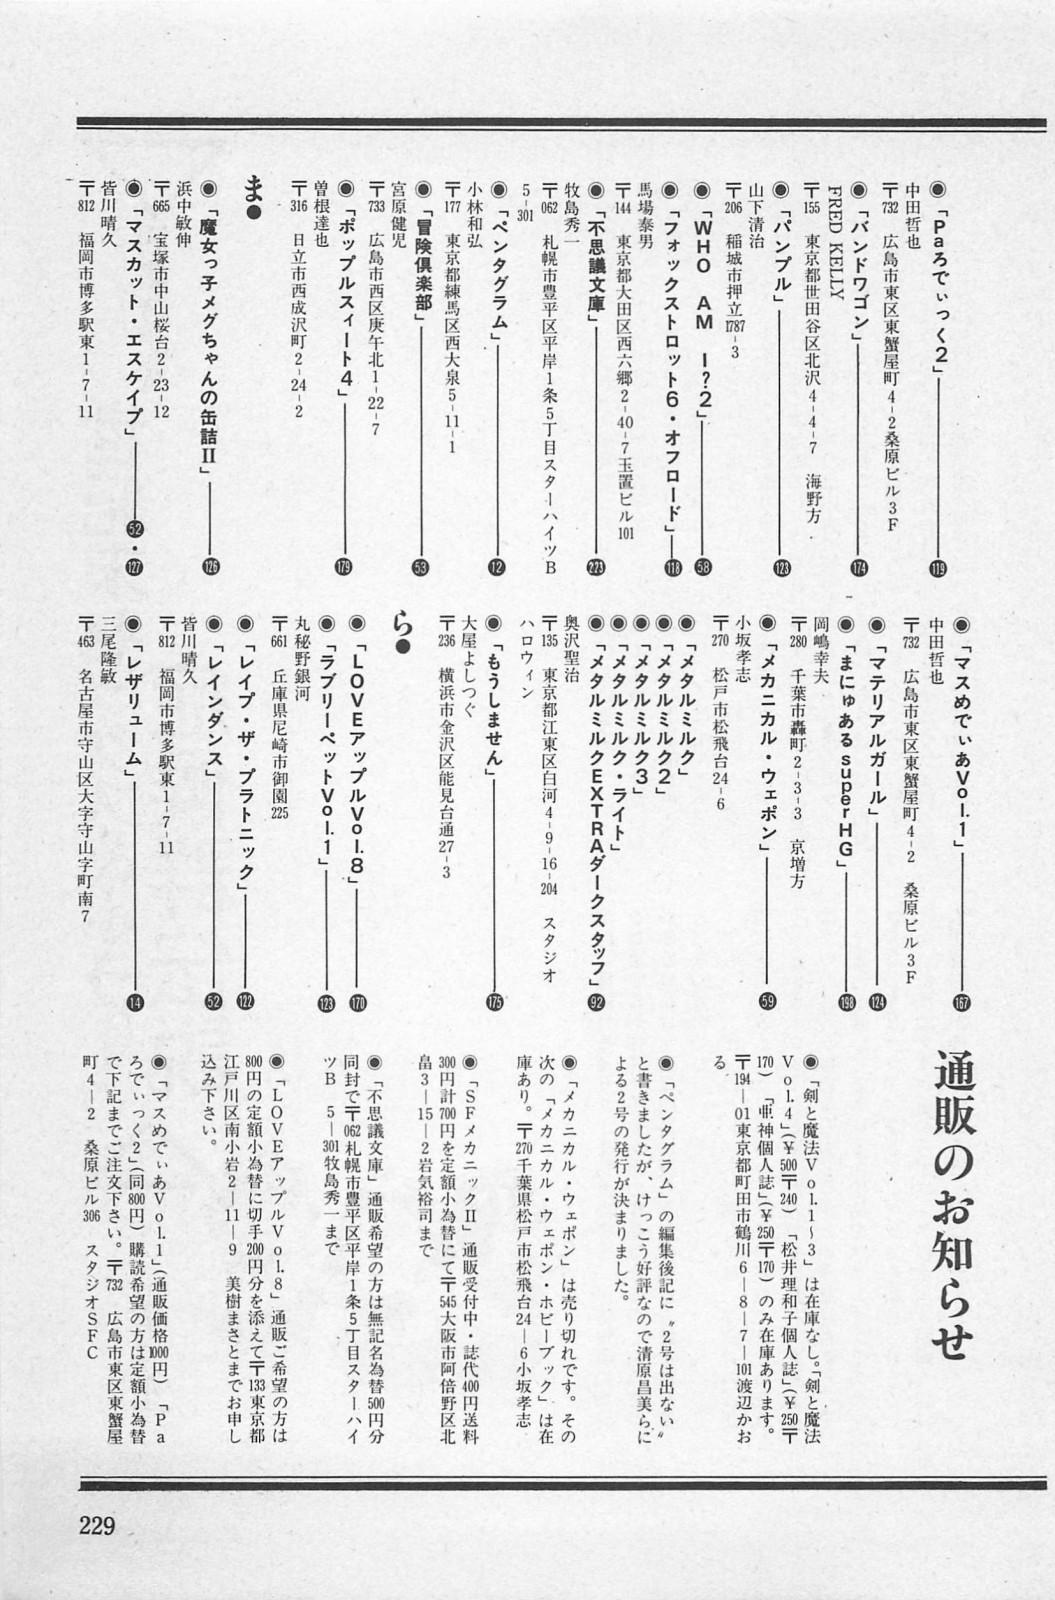 bishoujo syndrome 3 230